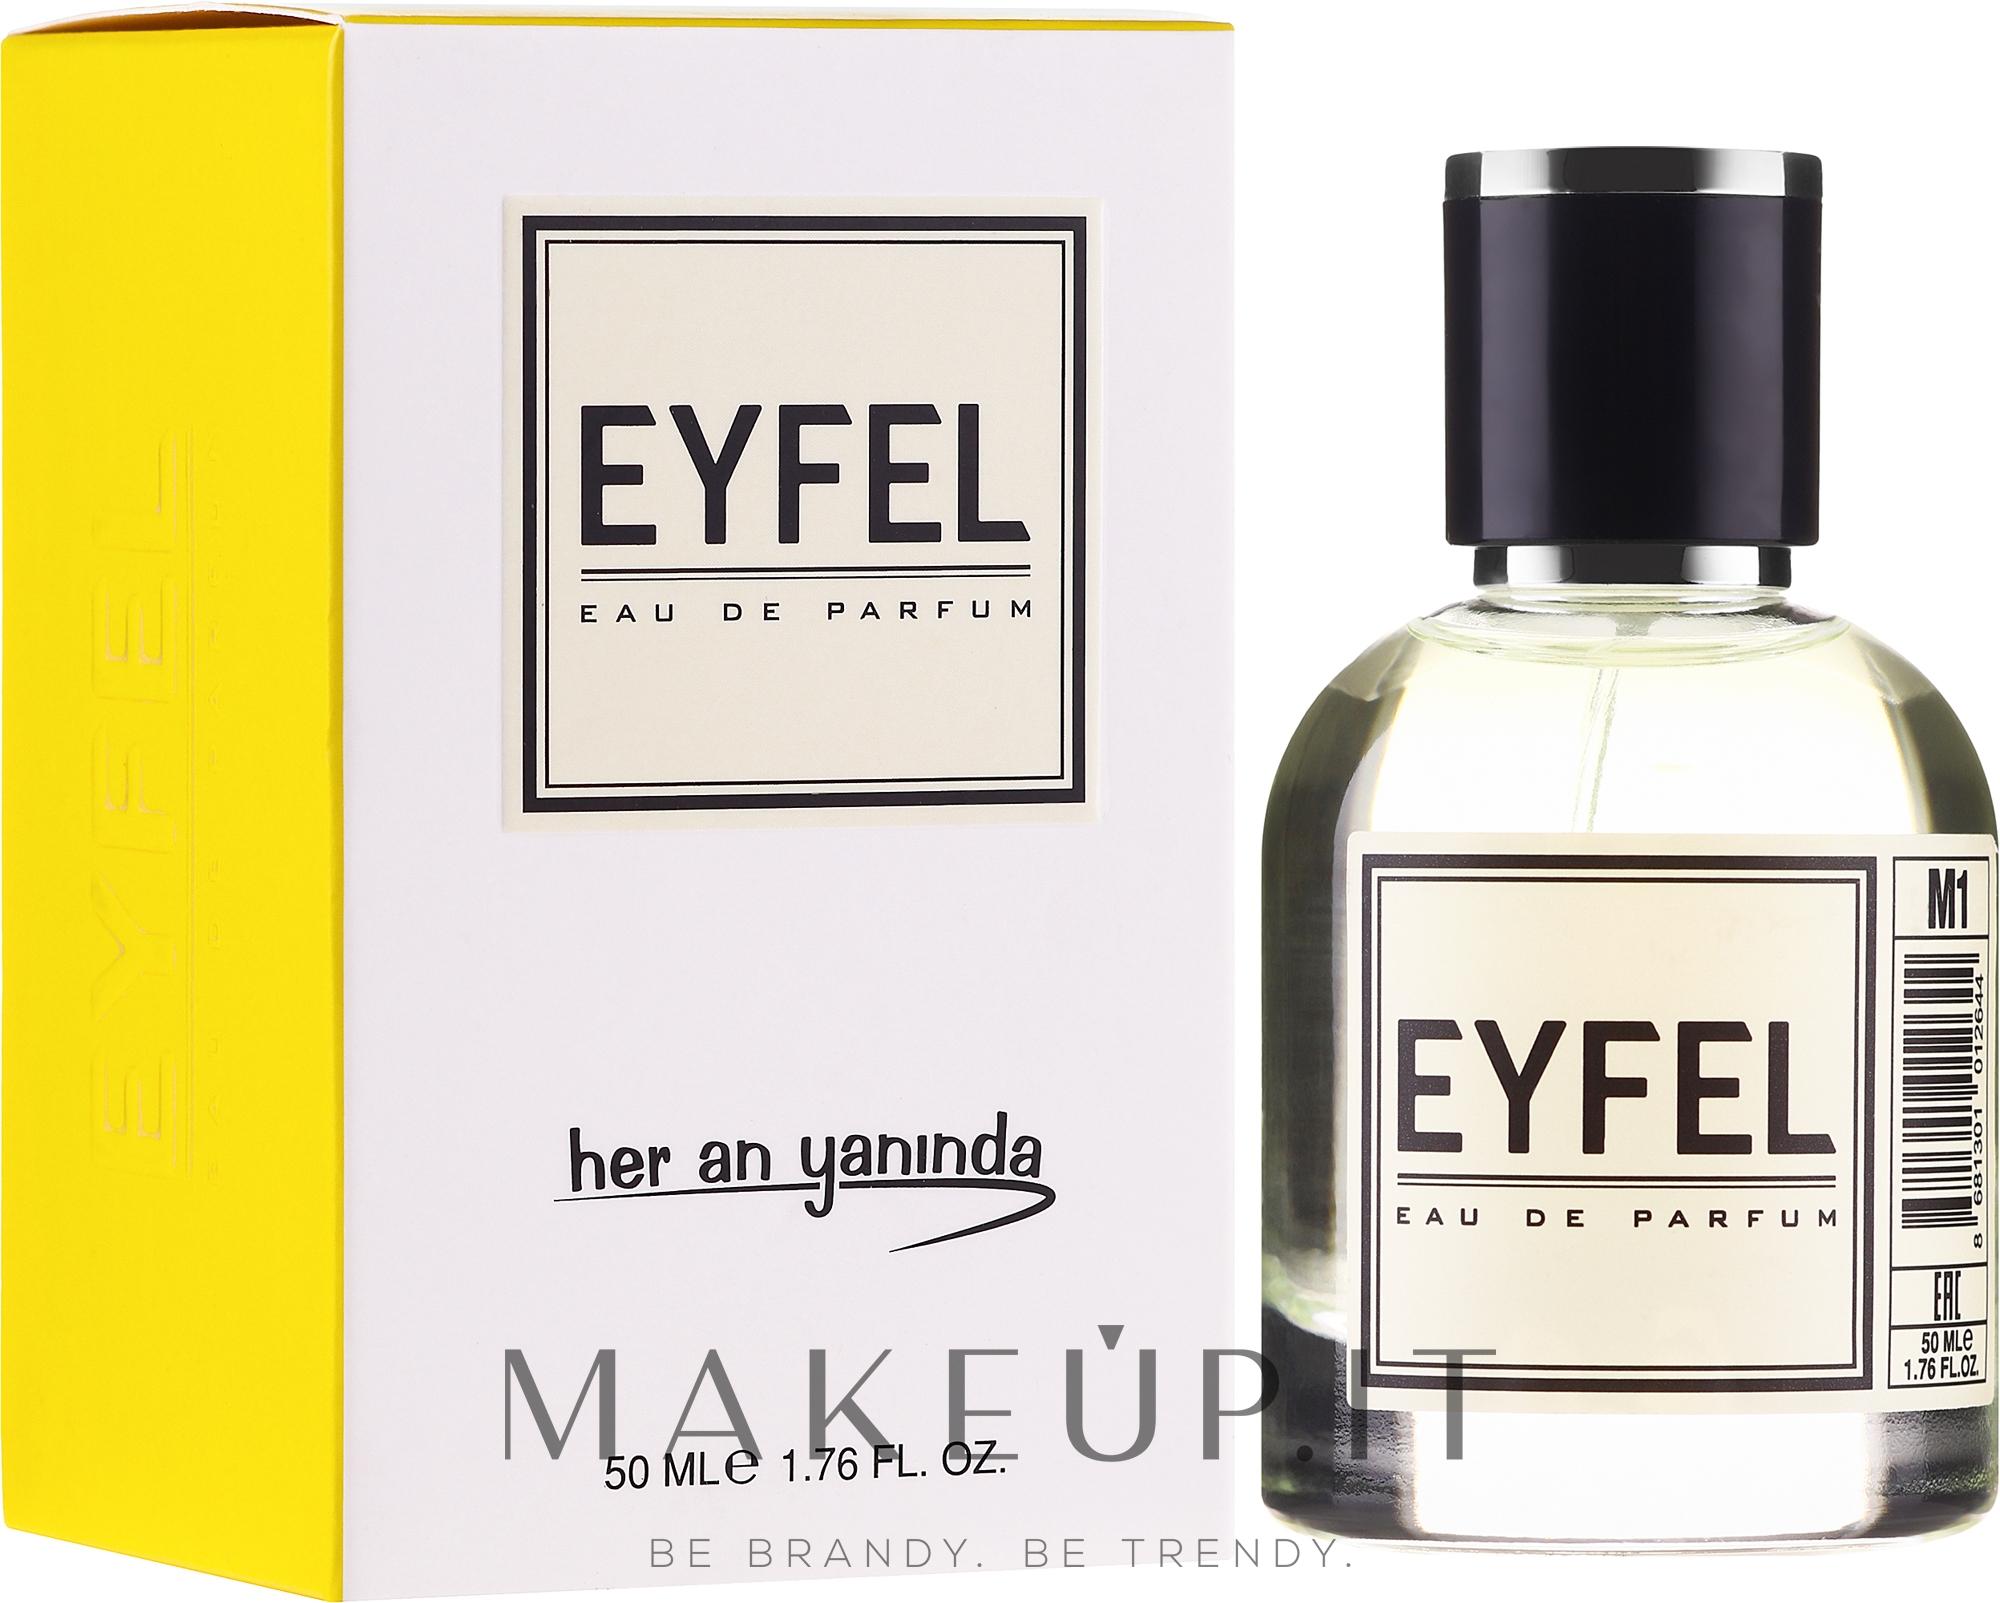 Eyfel Perfum M-1 - Eau de Parfum — foto 50 ml